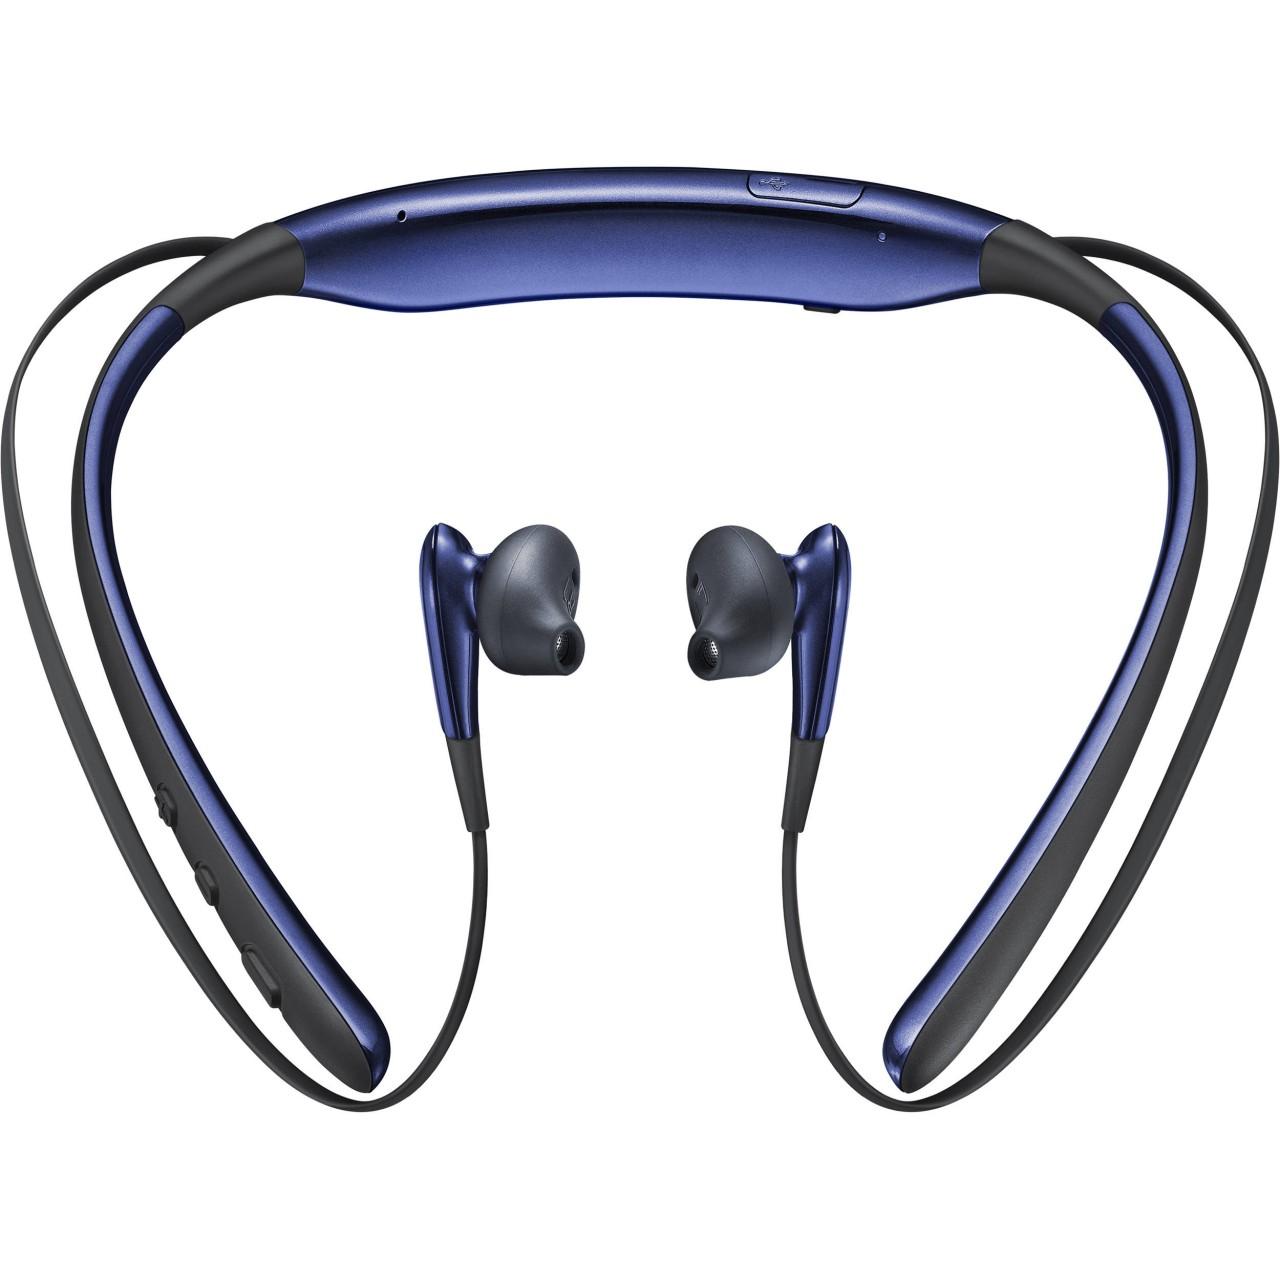 Samsung Level U Wireless Headphones Price In Pakistan H